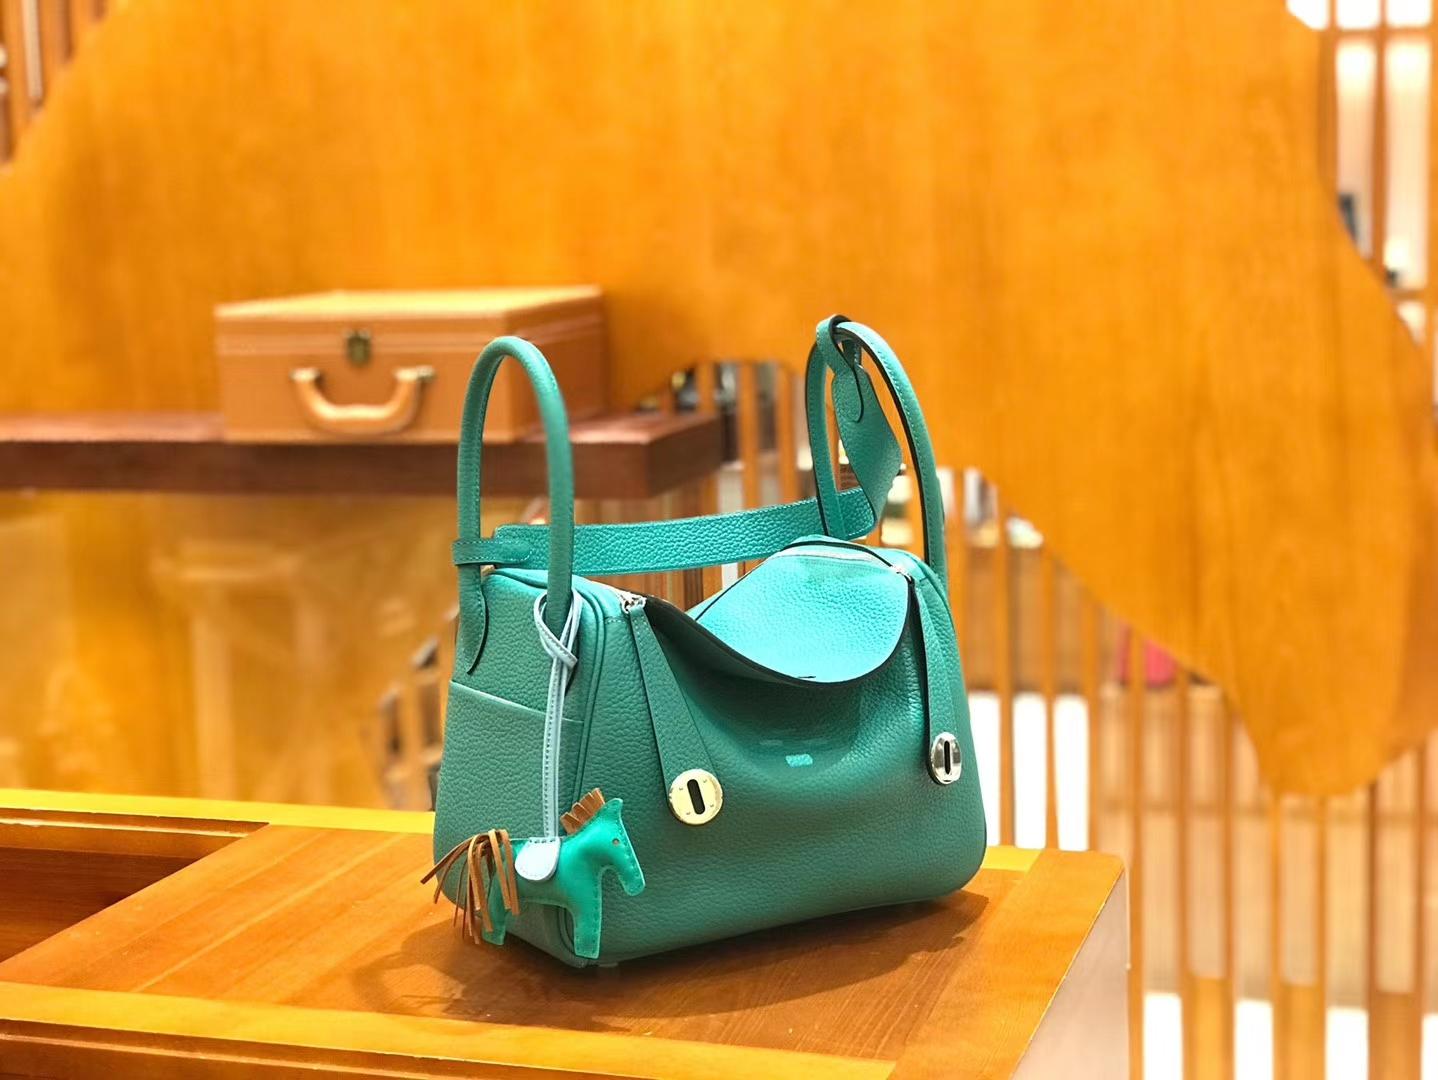 Hermès(爱马仕)Lindy 琳迪包 新颜色 维罗纳绿 Togo牛皮 进口原料 全手工缝制 银扣 26cm